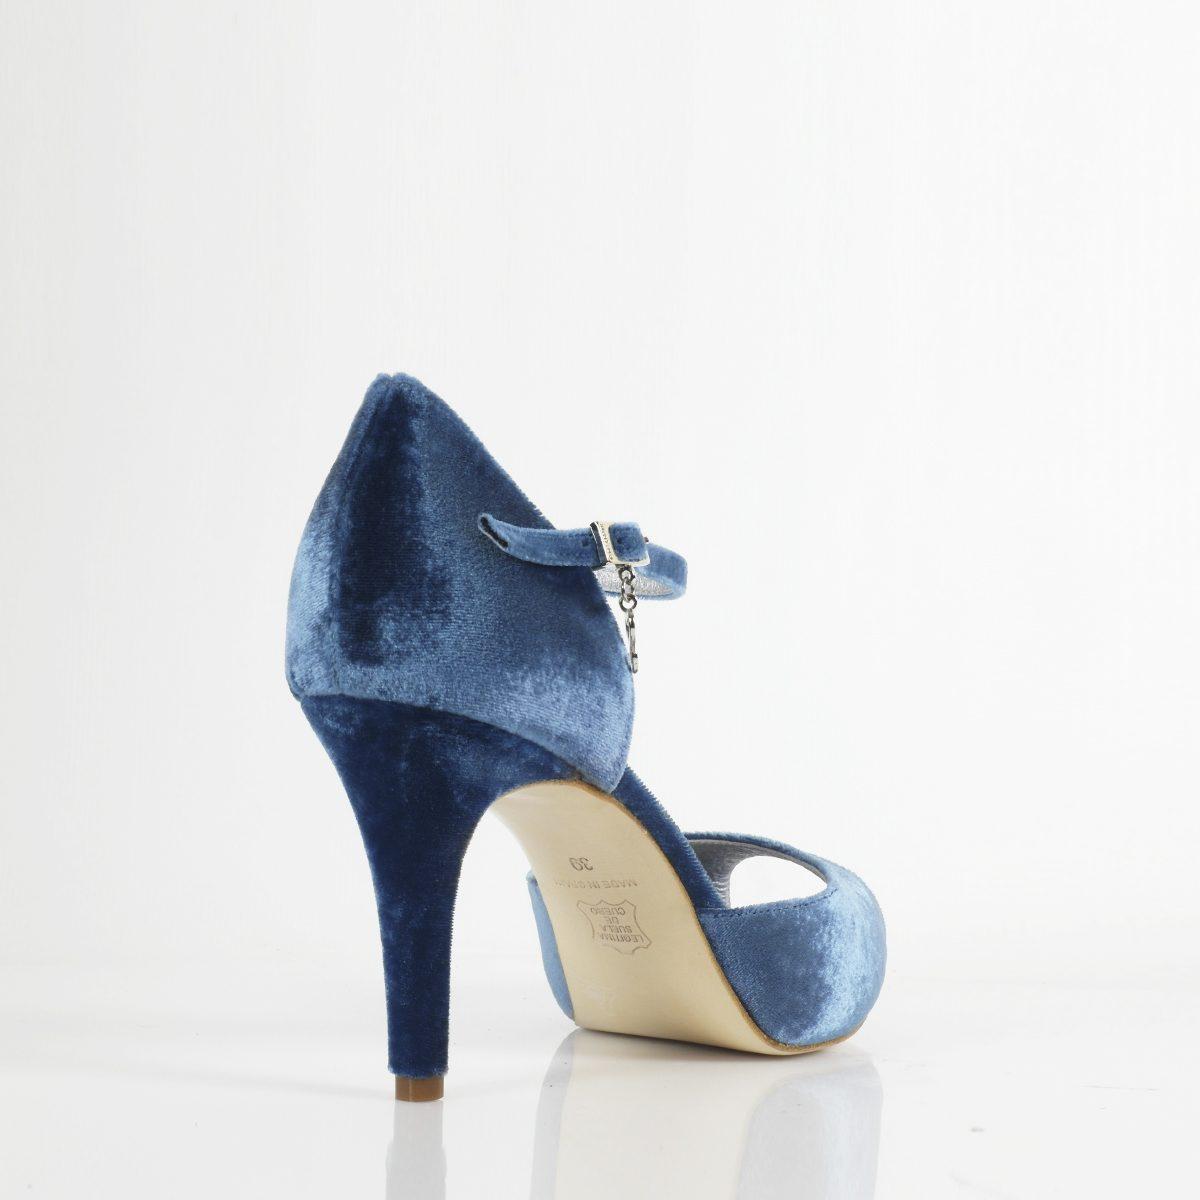 SANDALIA MOD.1920 (10cm) - Zapatos Personalizados Fiesta